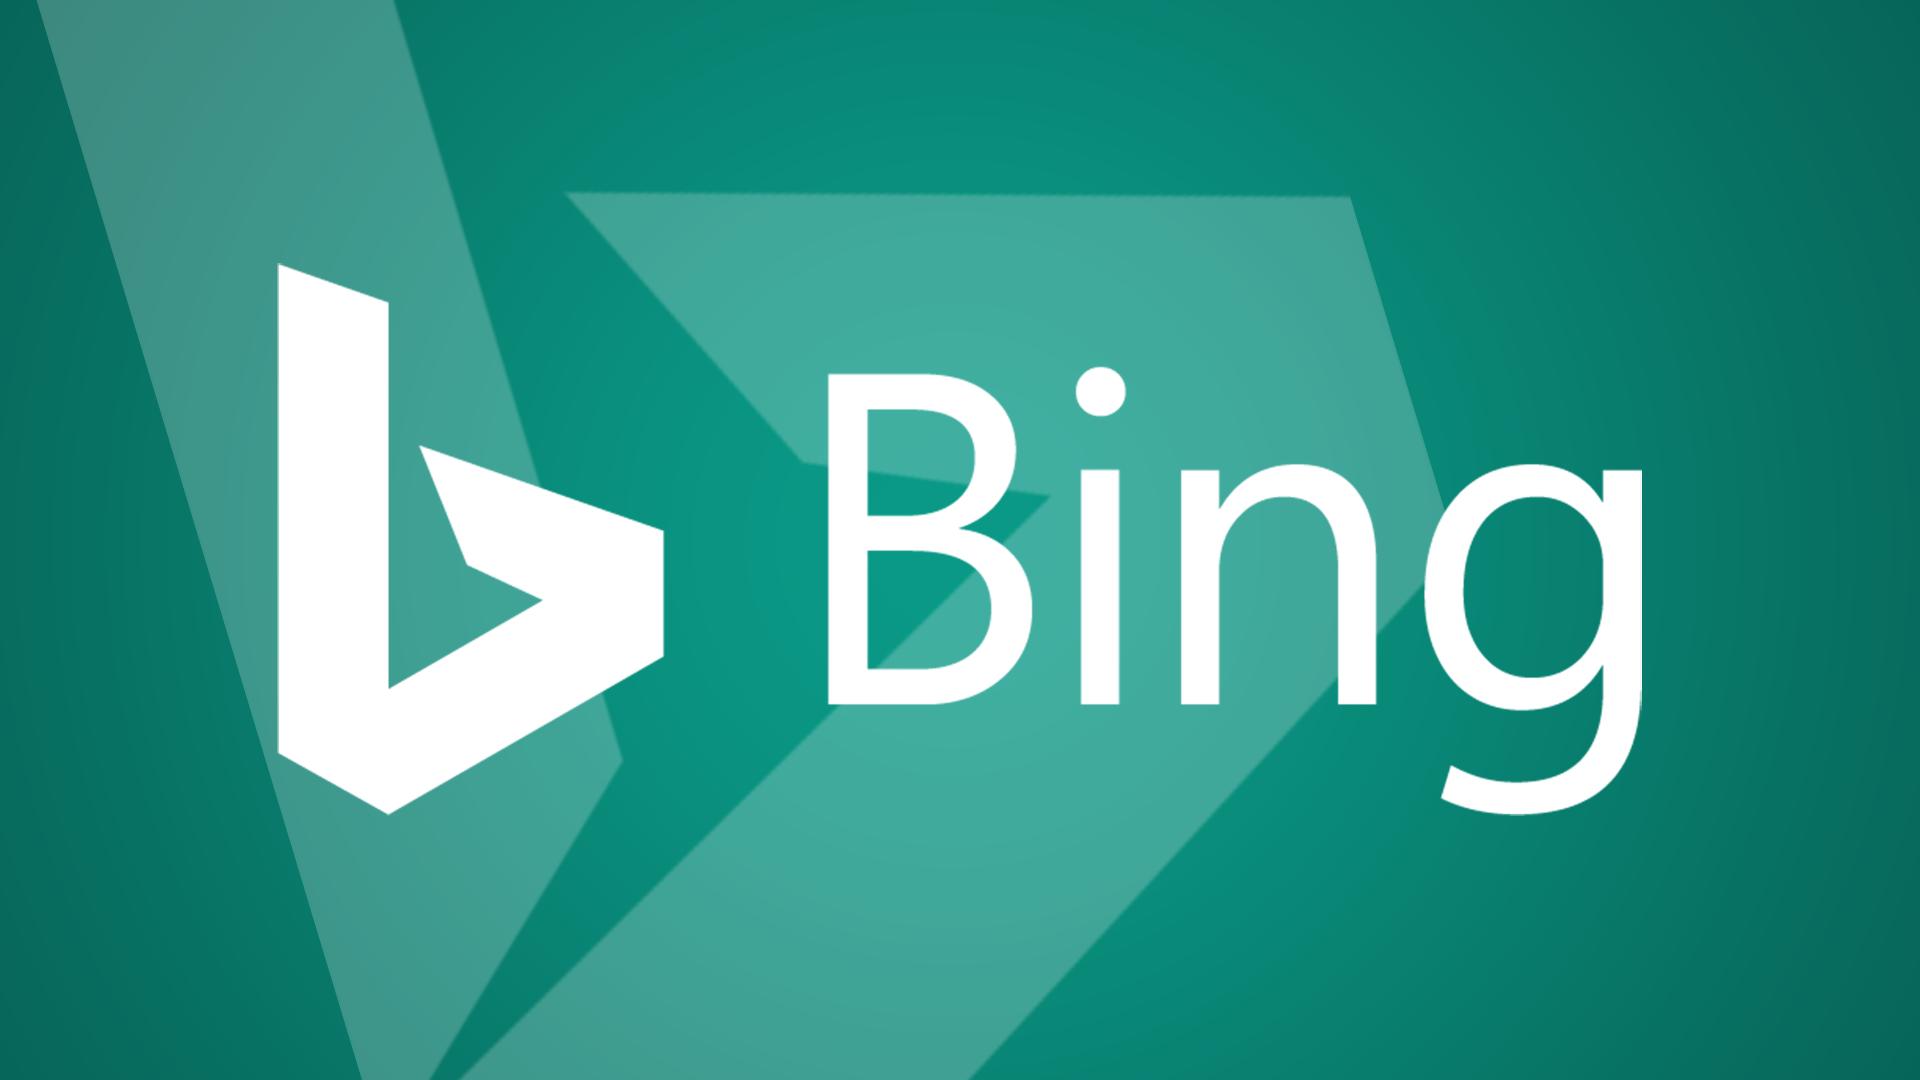 bing-teal-logo-wordmark4-1920